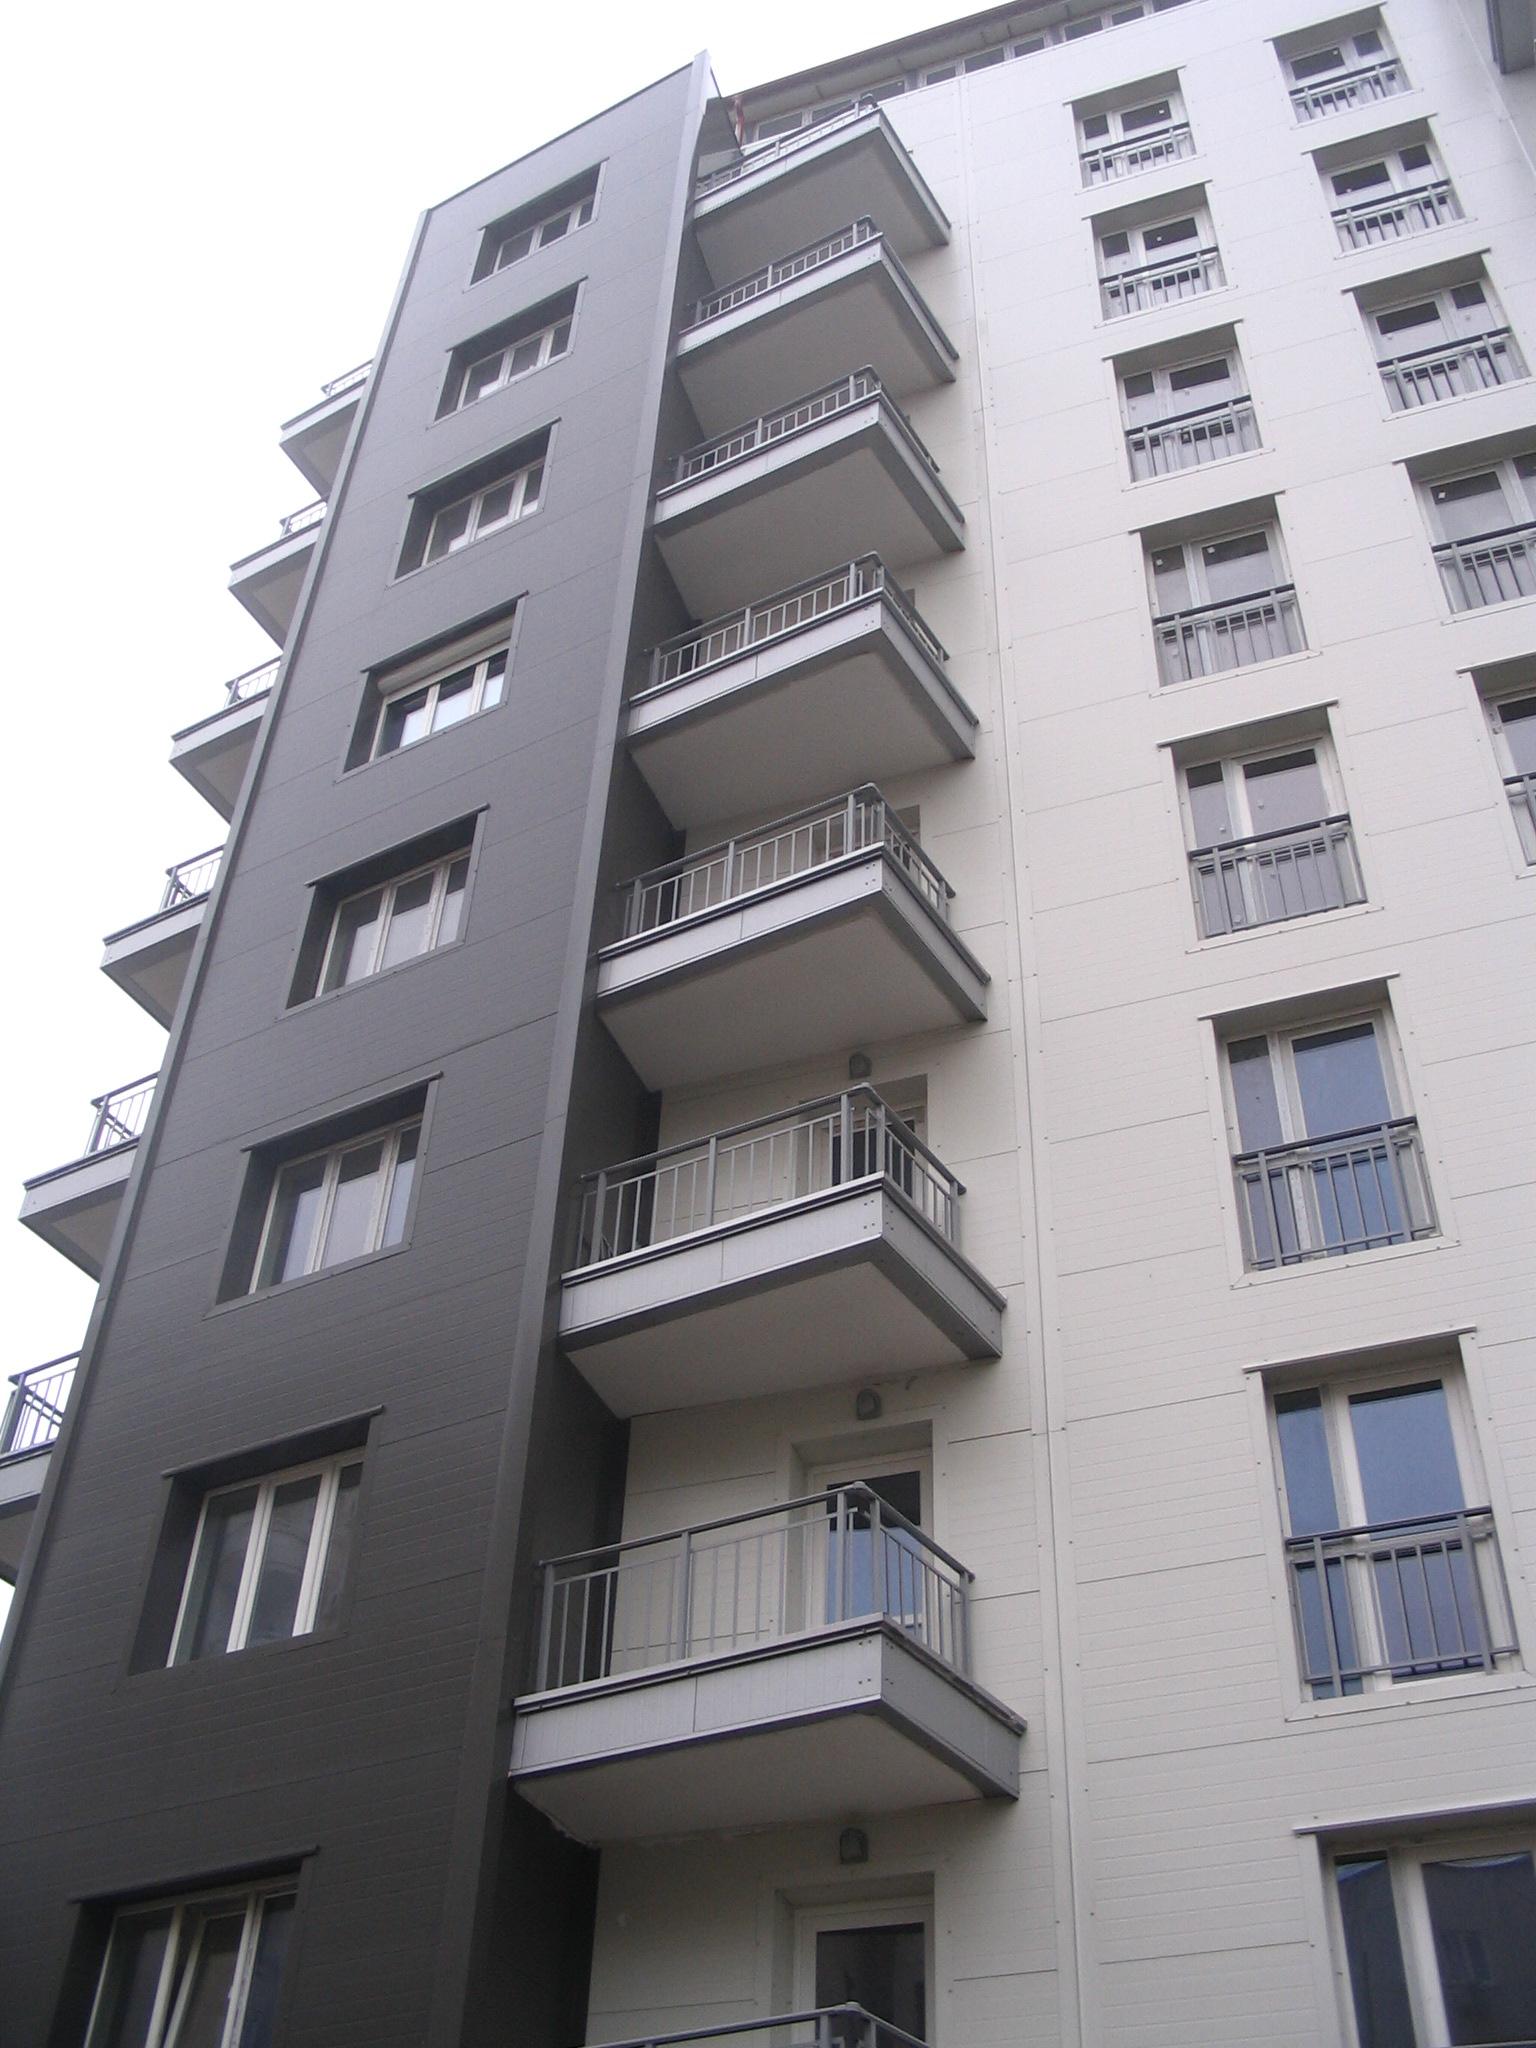 Ansamblu apartamente S+P+10 Str. Invingatorilor  - Poza 5